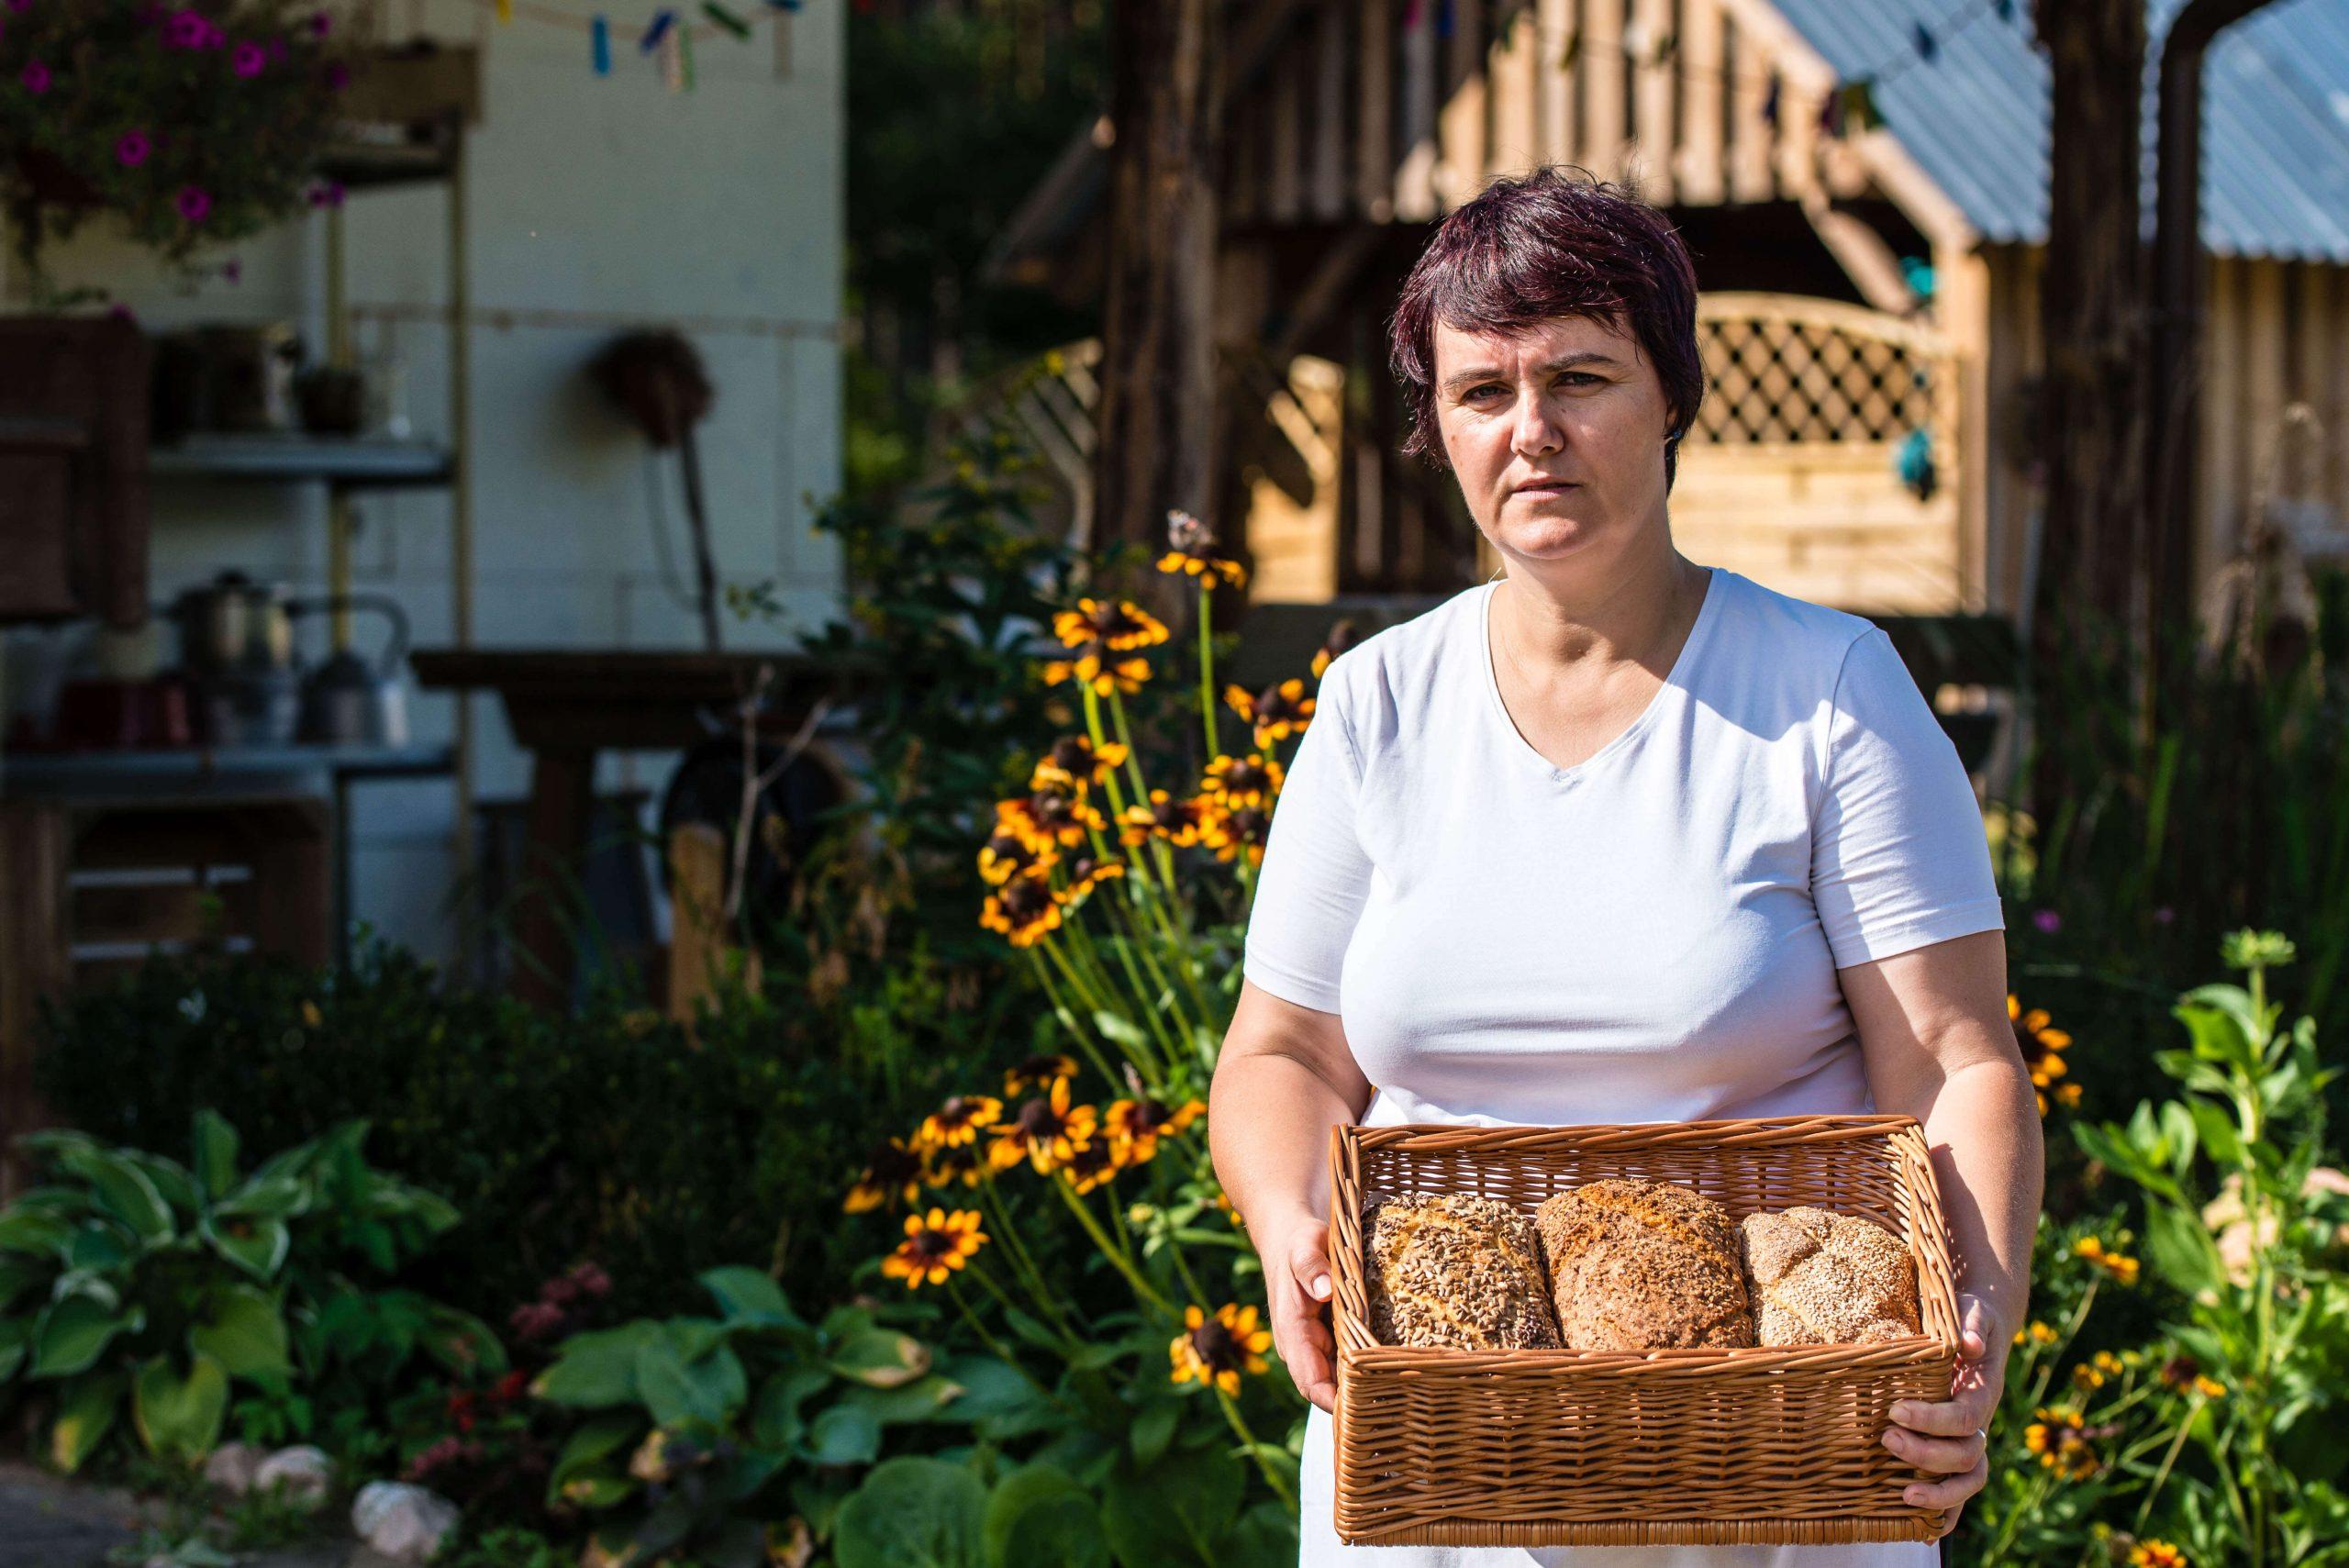 Karola Bober 5 1 scaled - Artisan bread in pomorskie - tradition and modernity